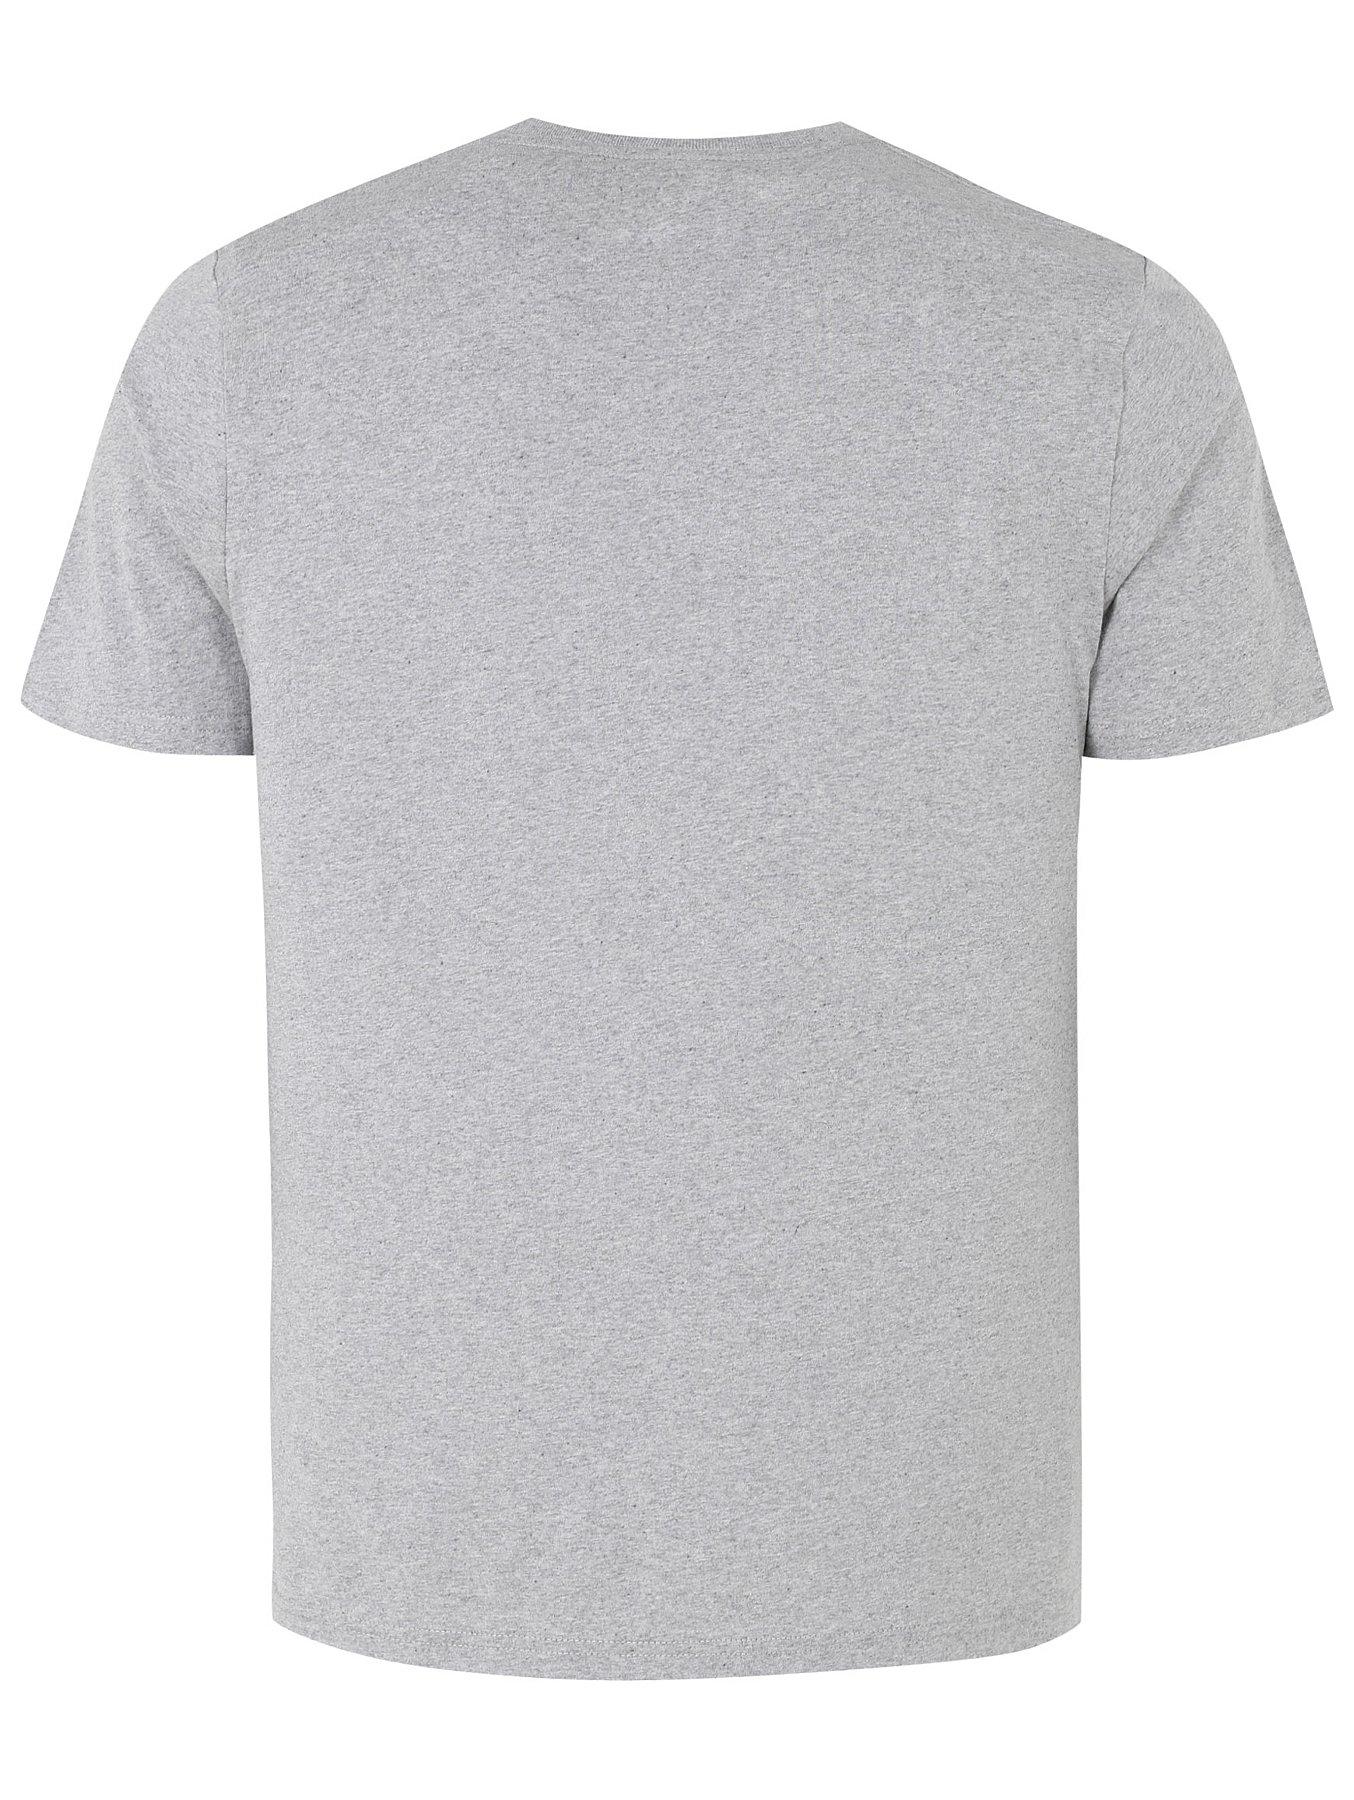 b5cfbc661 Harlem Globetrotters T-Shirt | Men | George